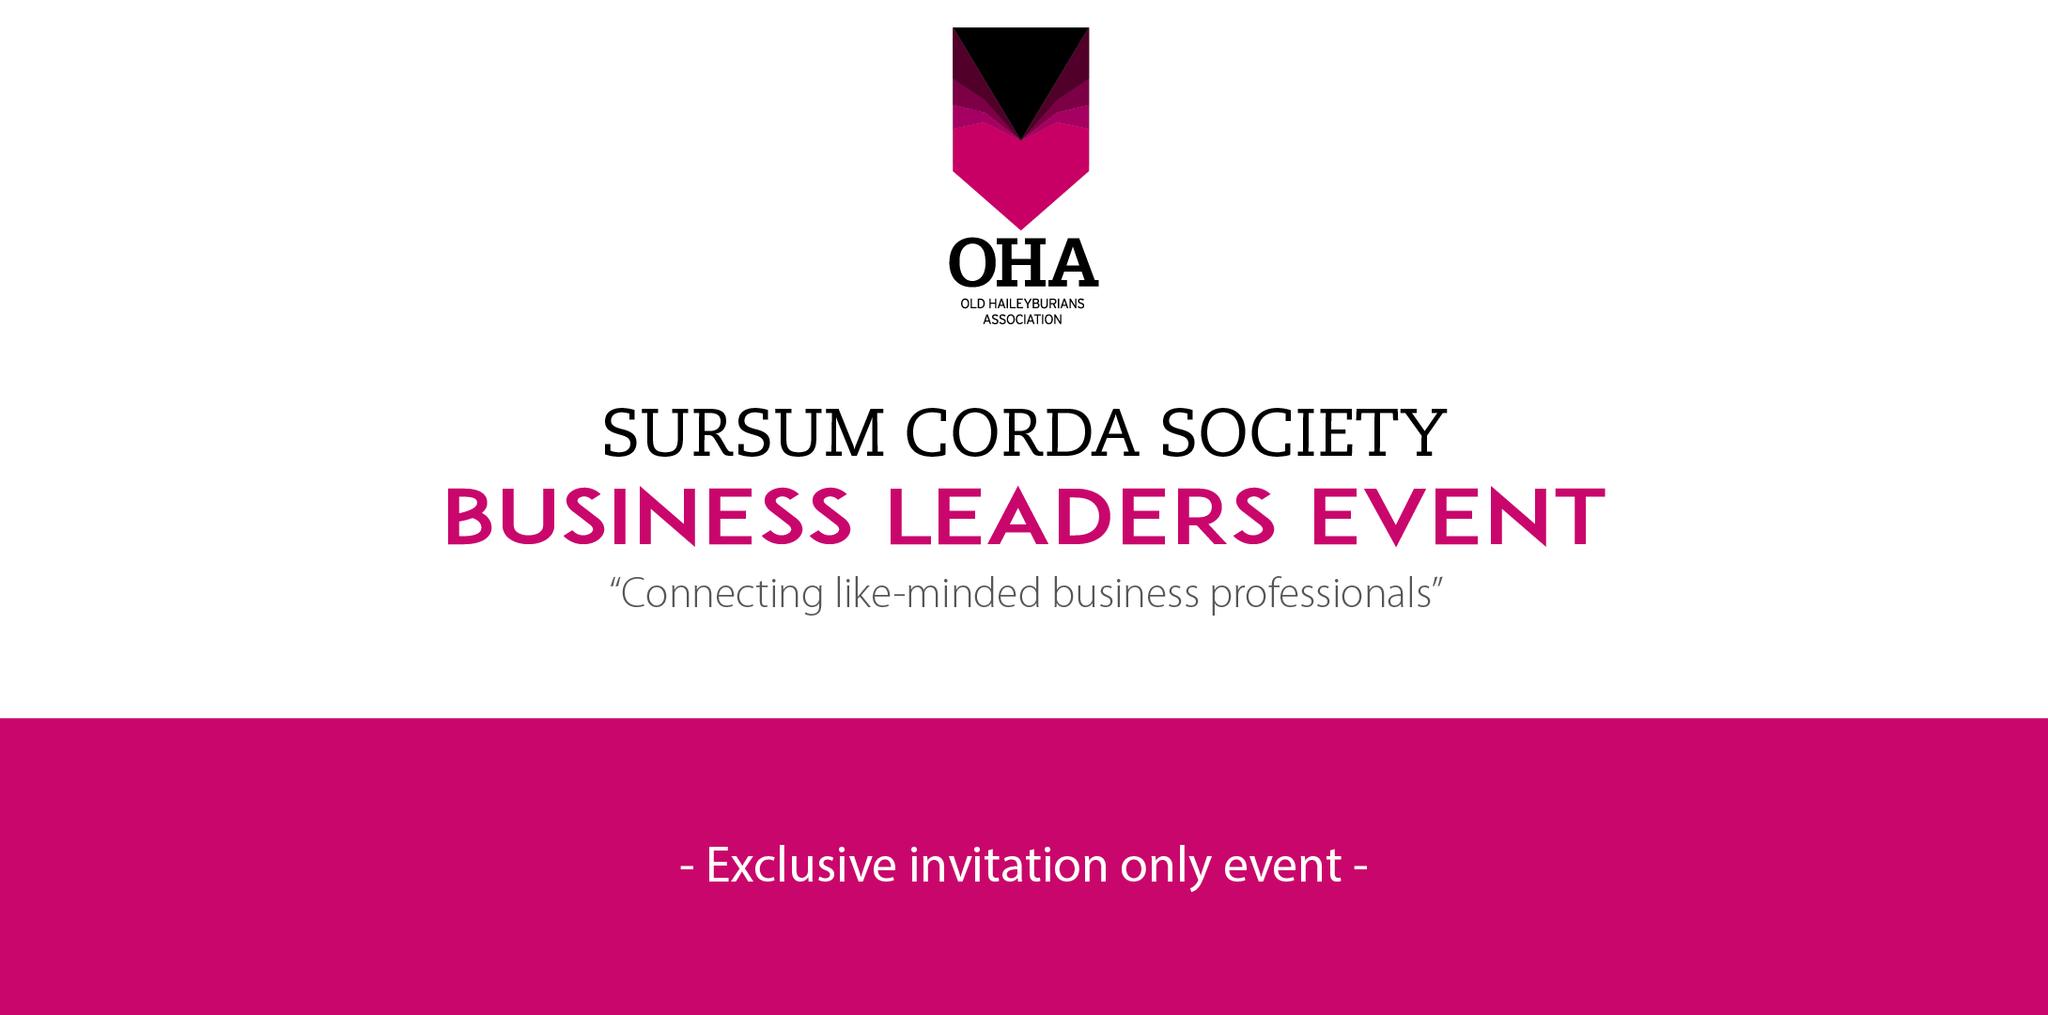 Sursum Corda Society - Business Leaders Event